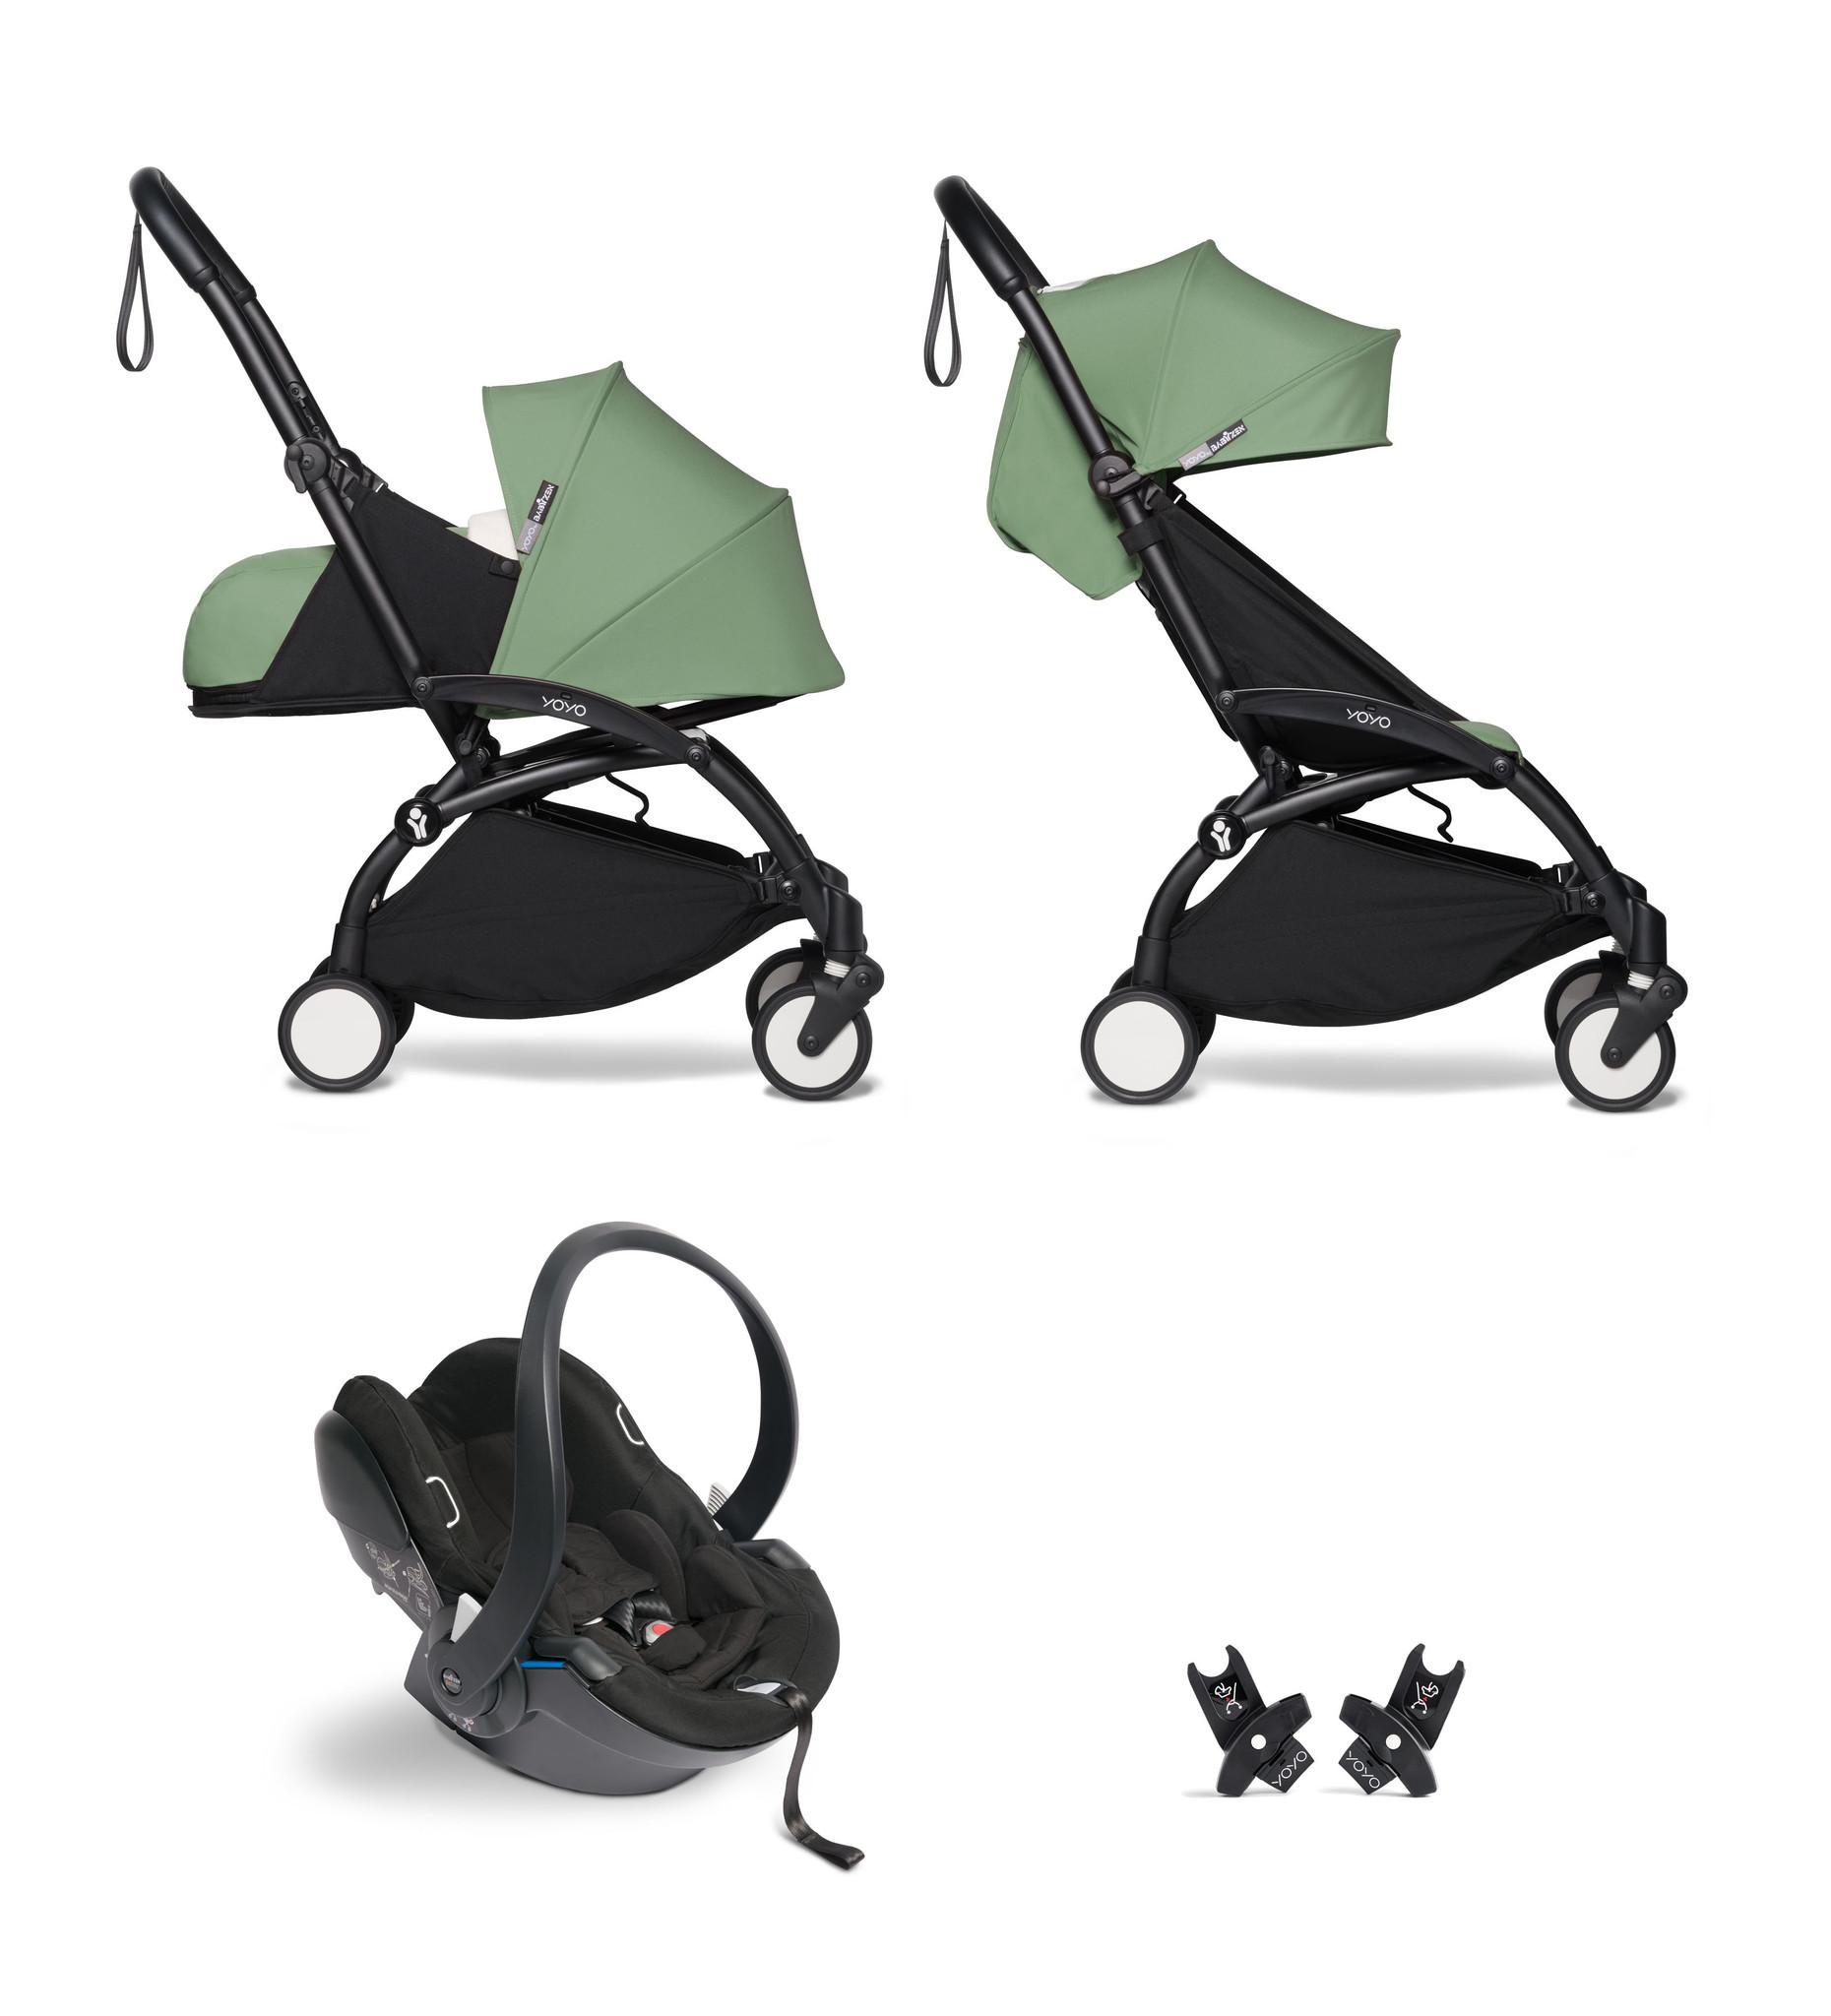 Babyzen Babyzen YOYO² Buggy KOMPLETT / VOLL SET 0+ und 6+ Pfefferminzrahmen schwarz inkl. YOYO² BeSafe Autositz schwarz